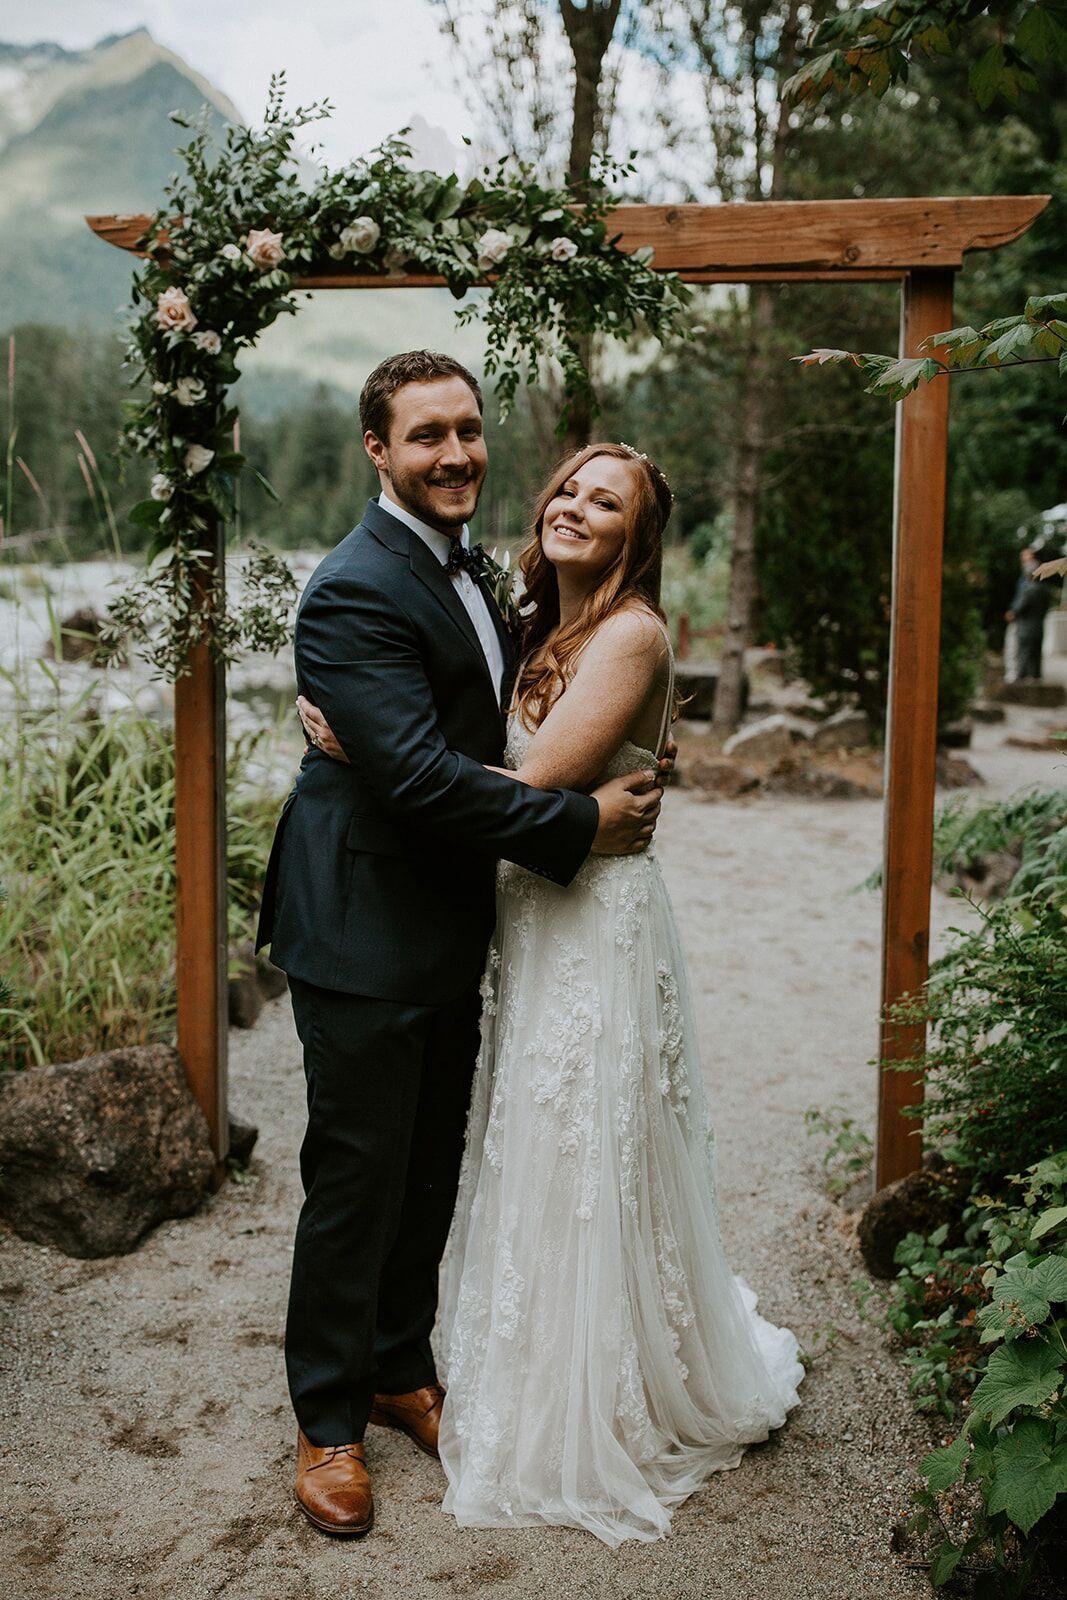 Blue-Sky-Ranch-Wedding-Block-Weddings-and-Events19.jpeg